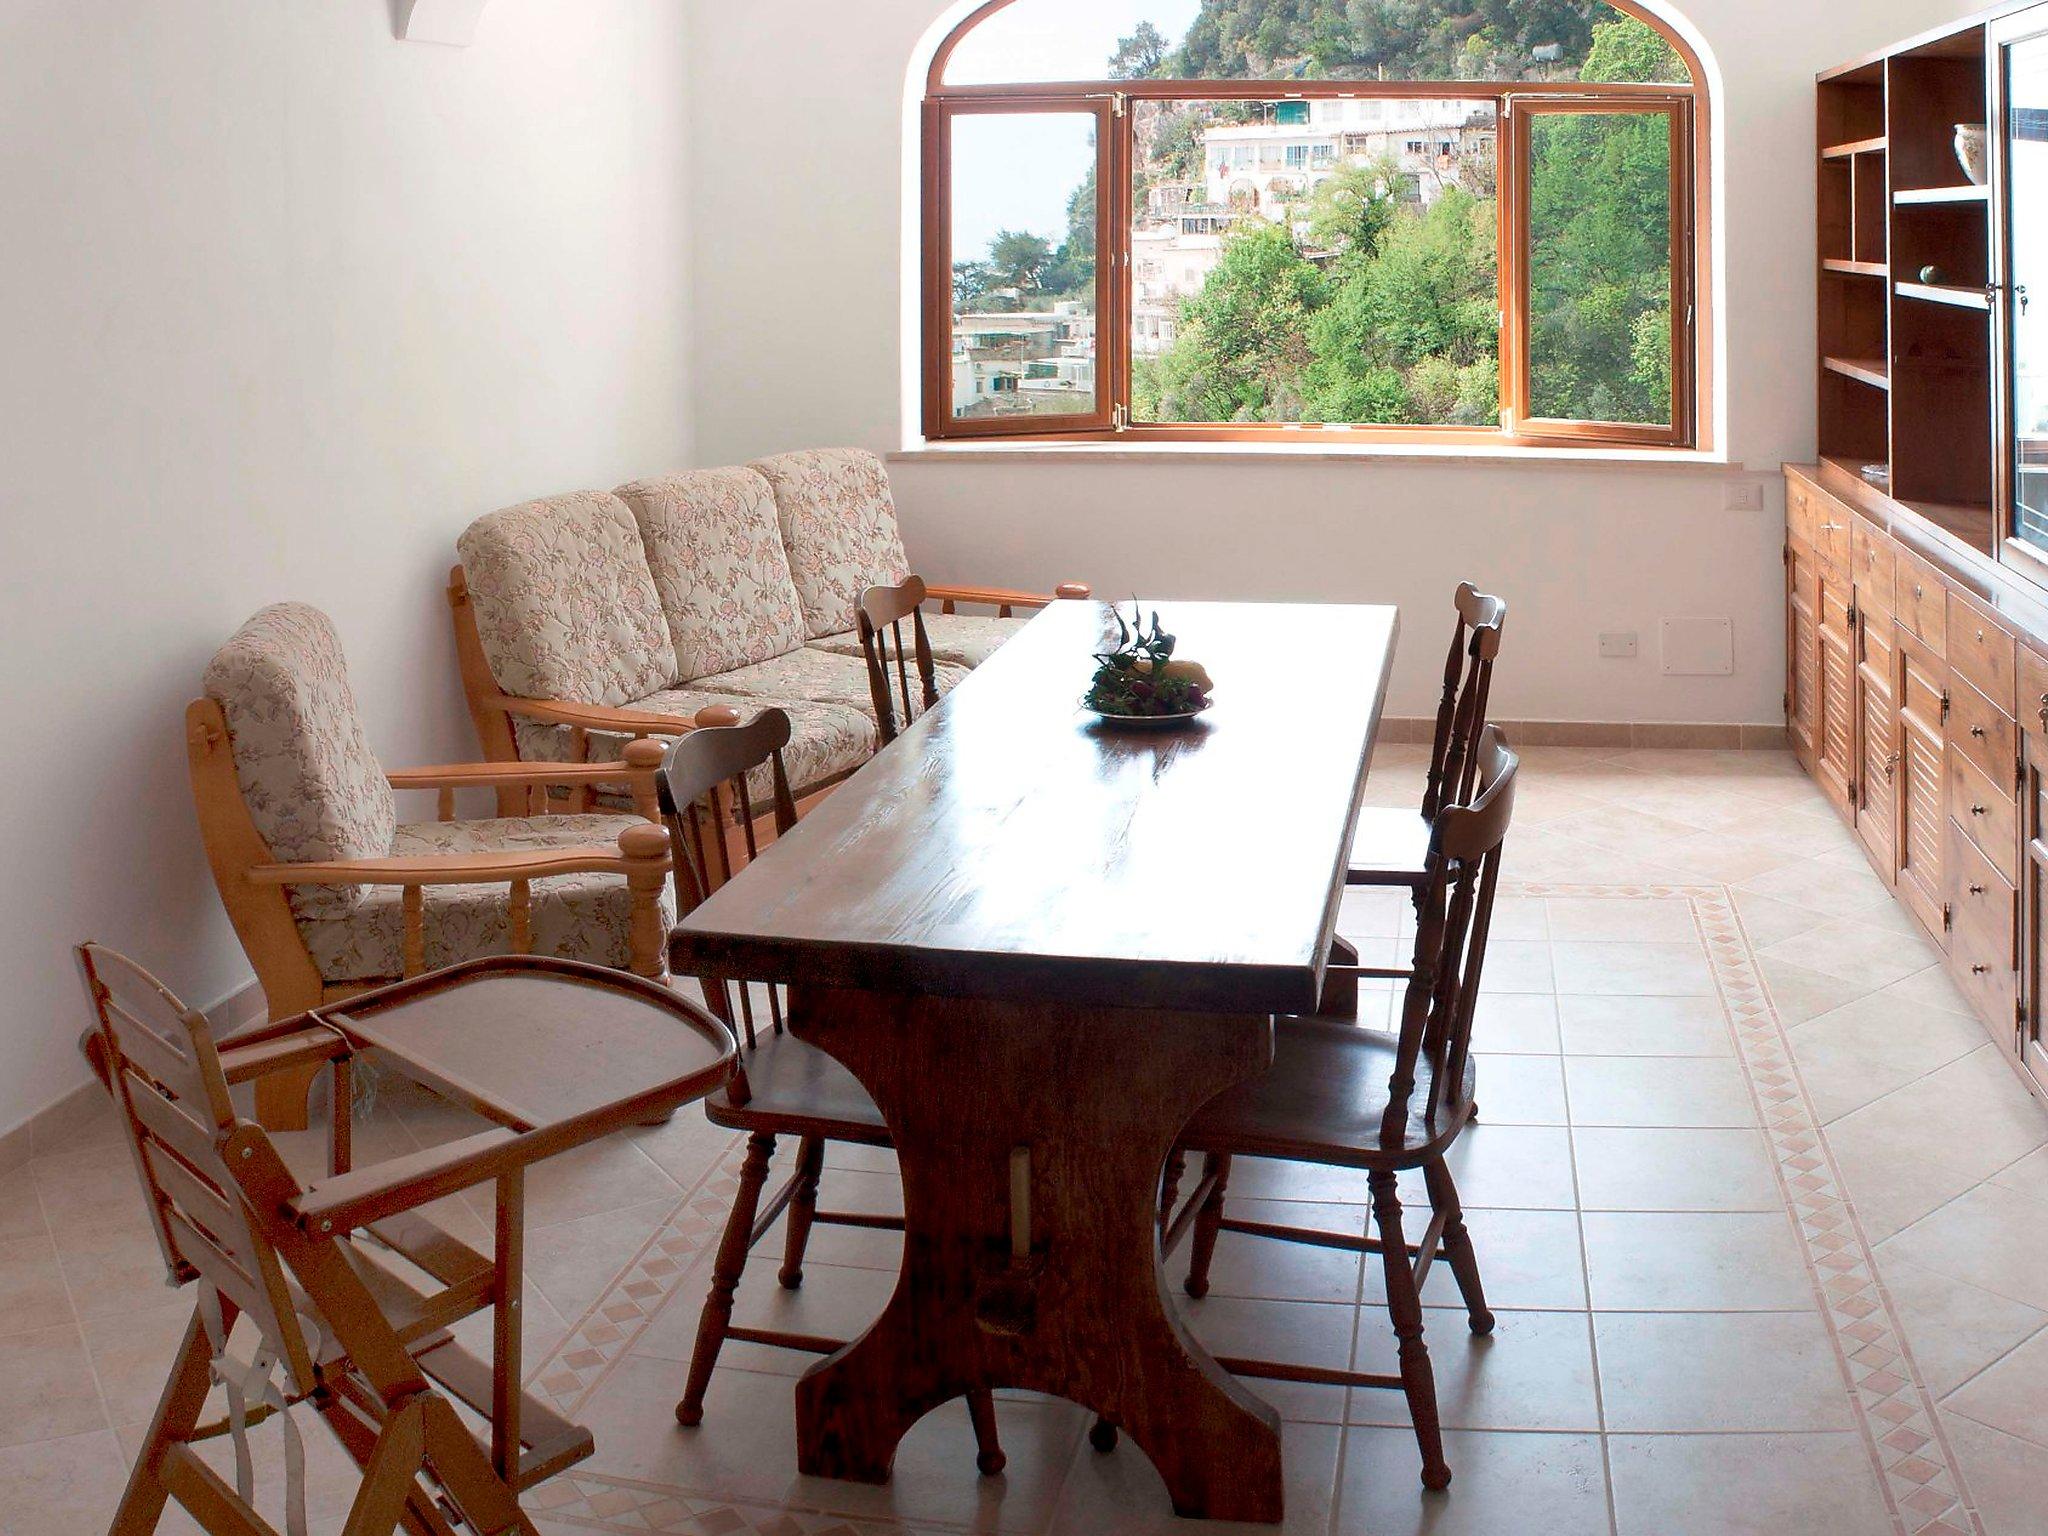 Positano, Italy Apartment #RU149085